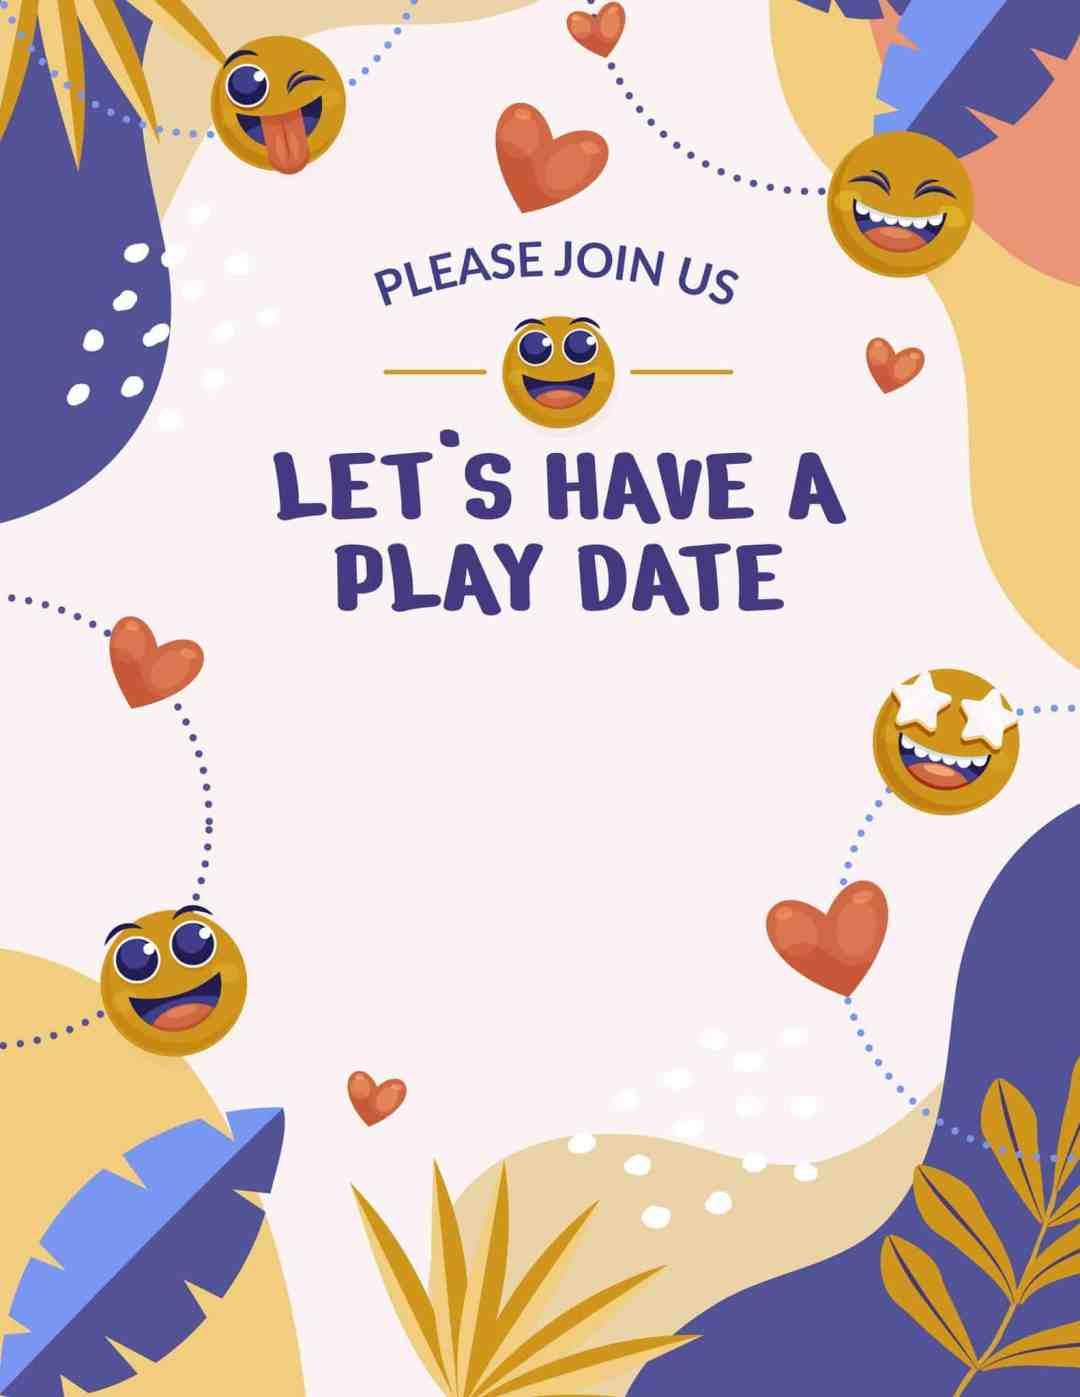 Free Play Date Invitations - All Free Invitations